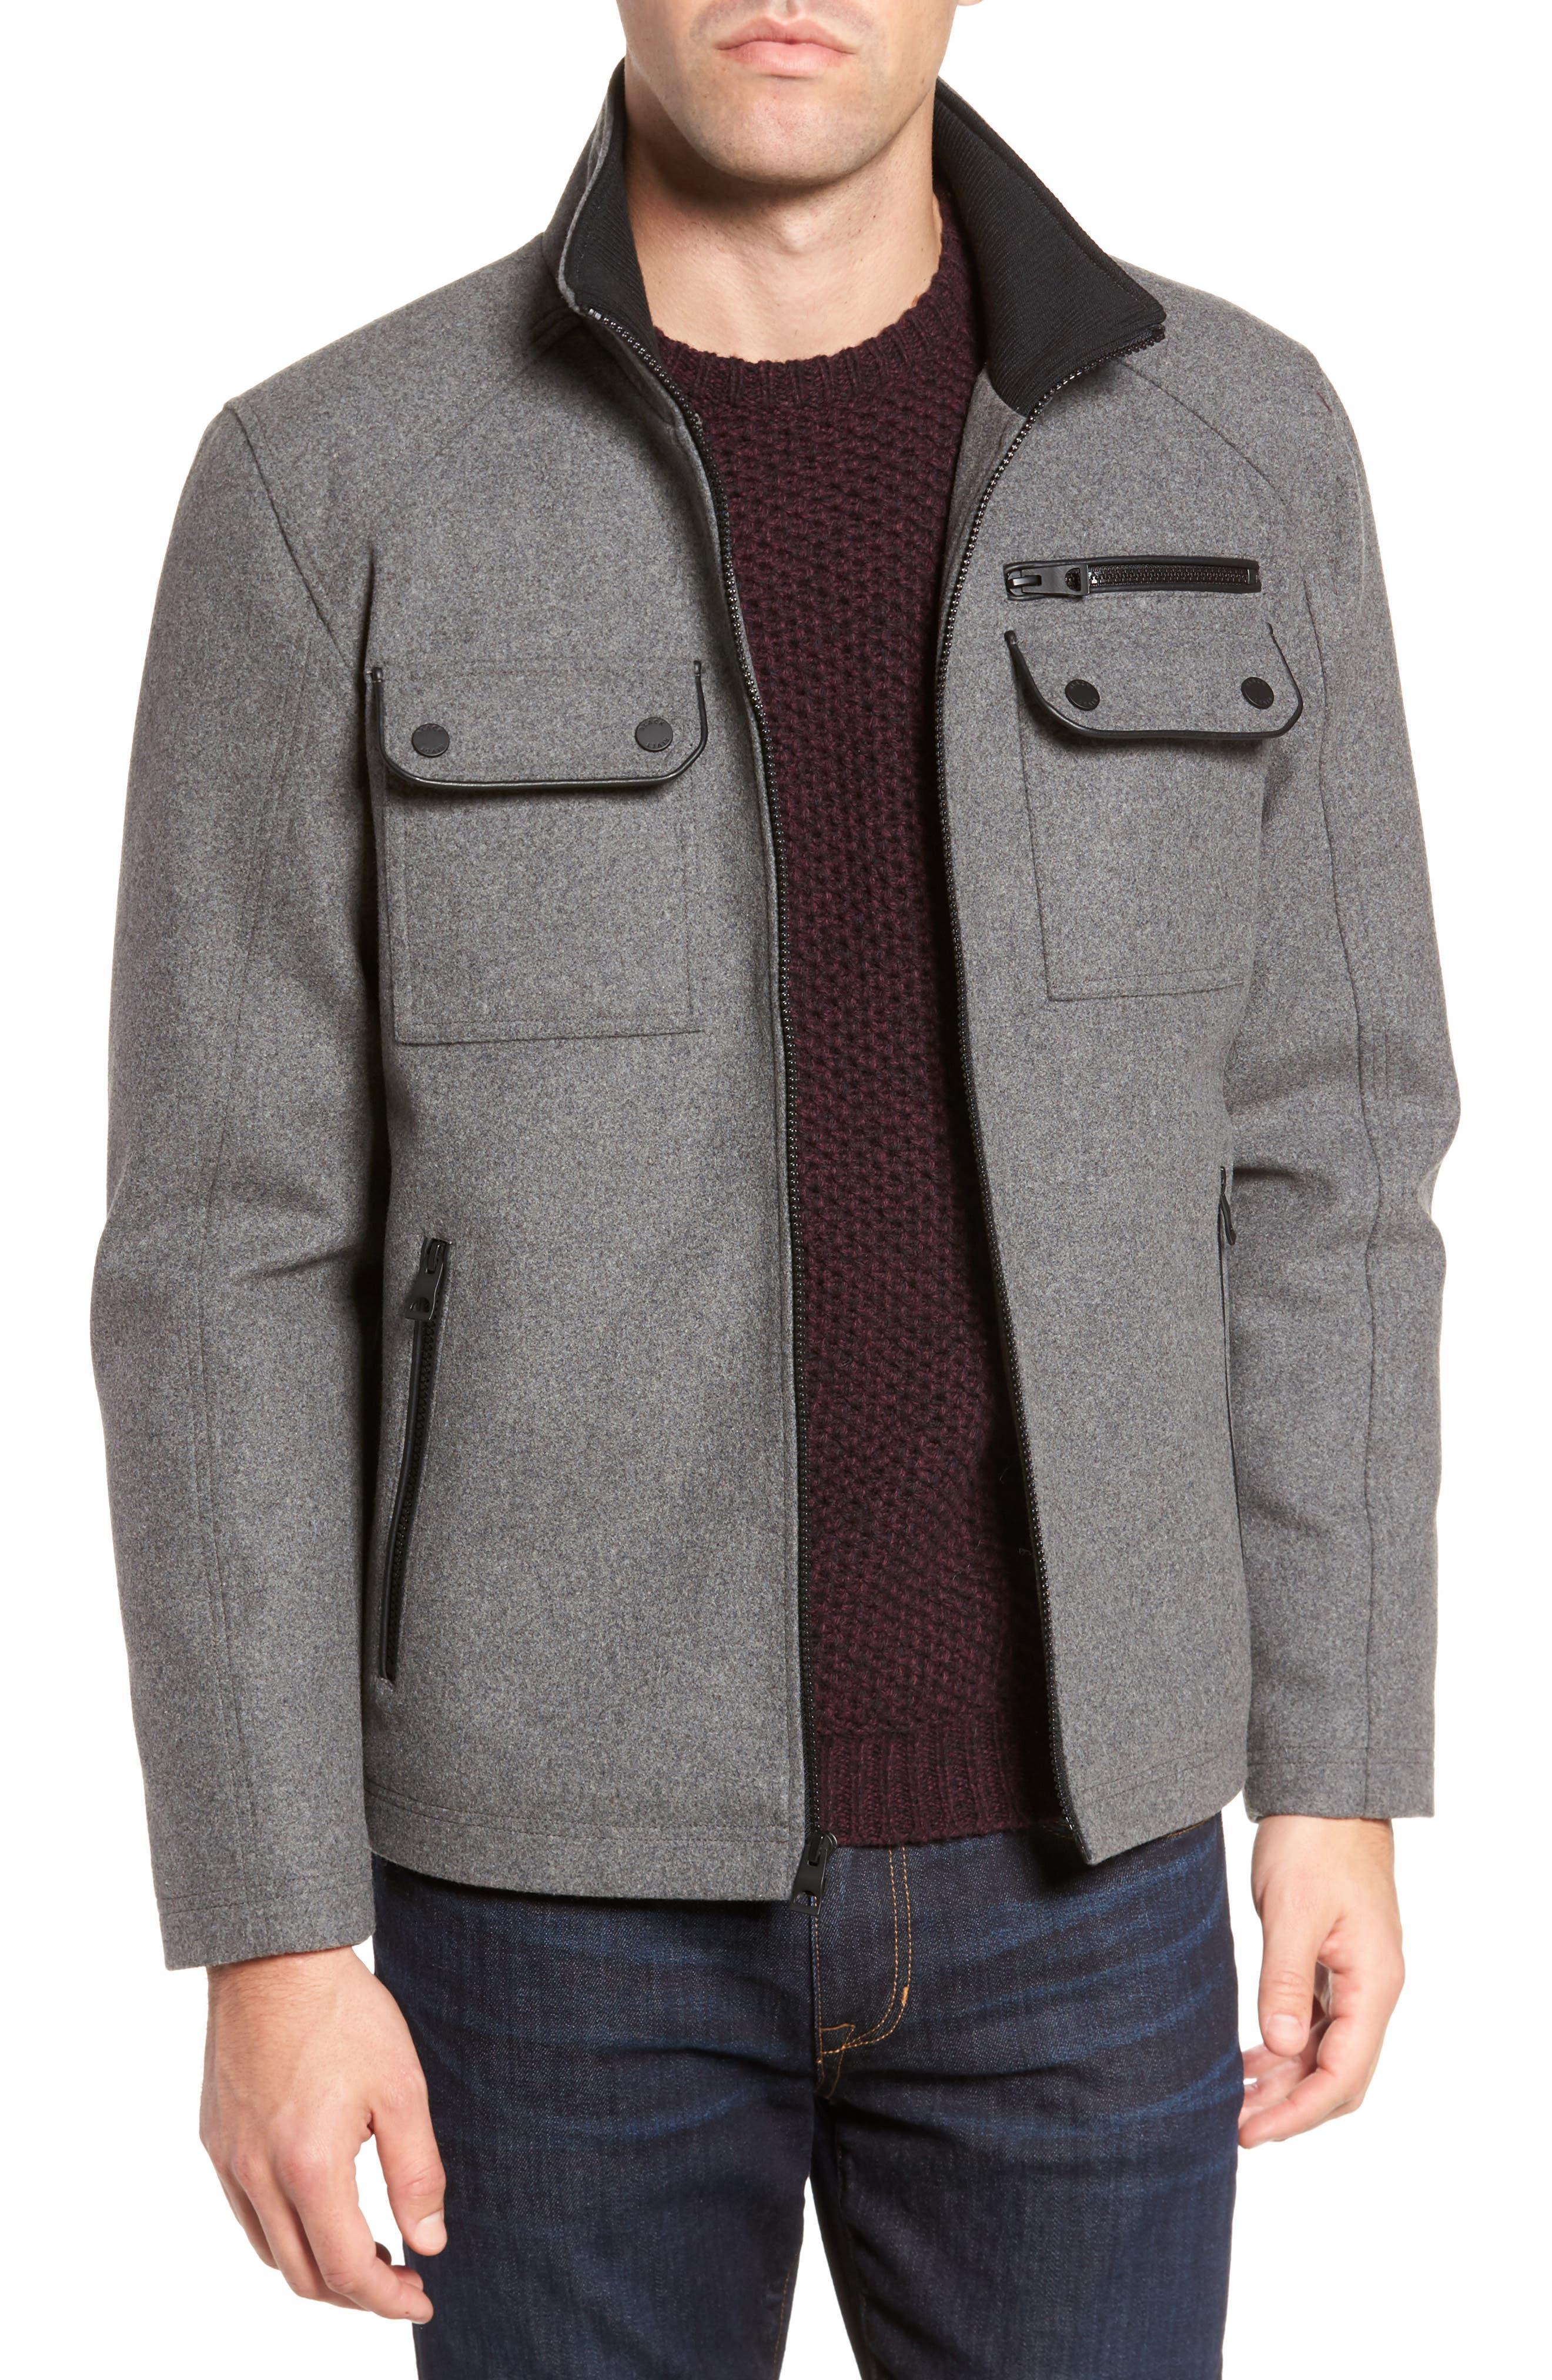 Black Rivet Stand Collar Wool Blend Jacket